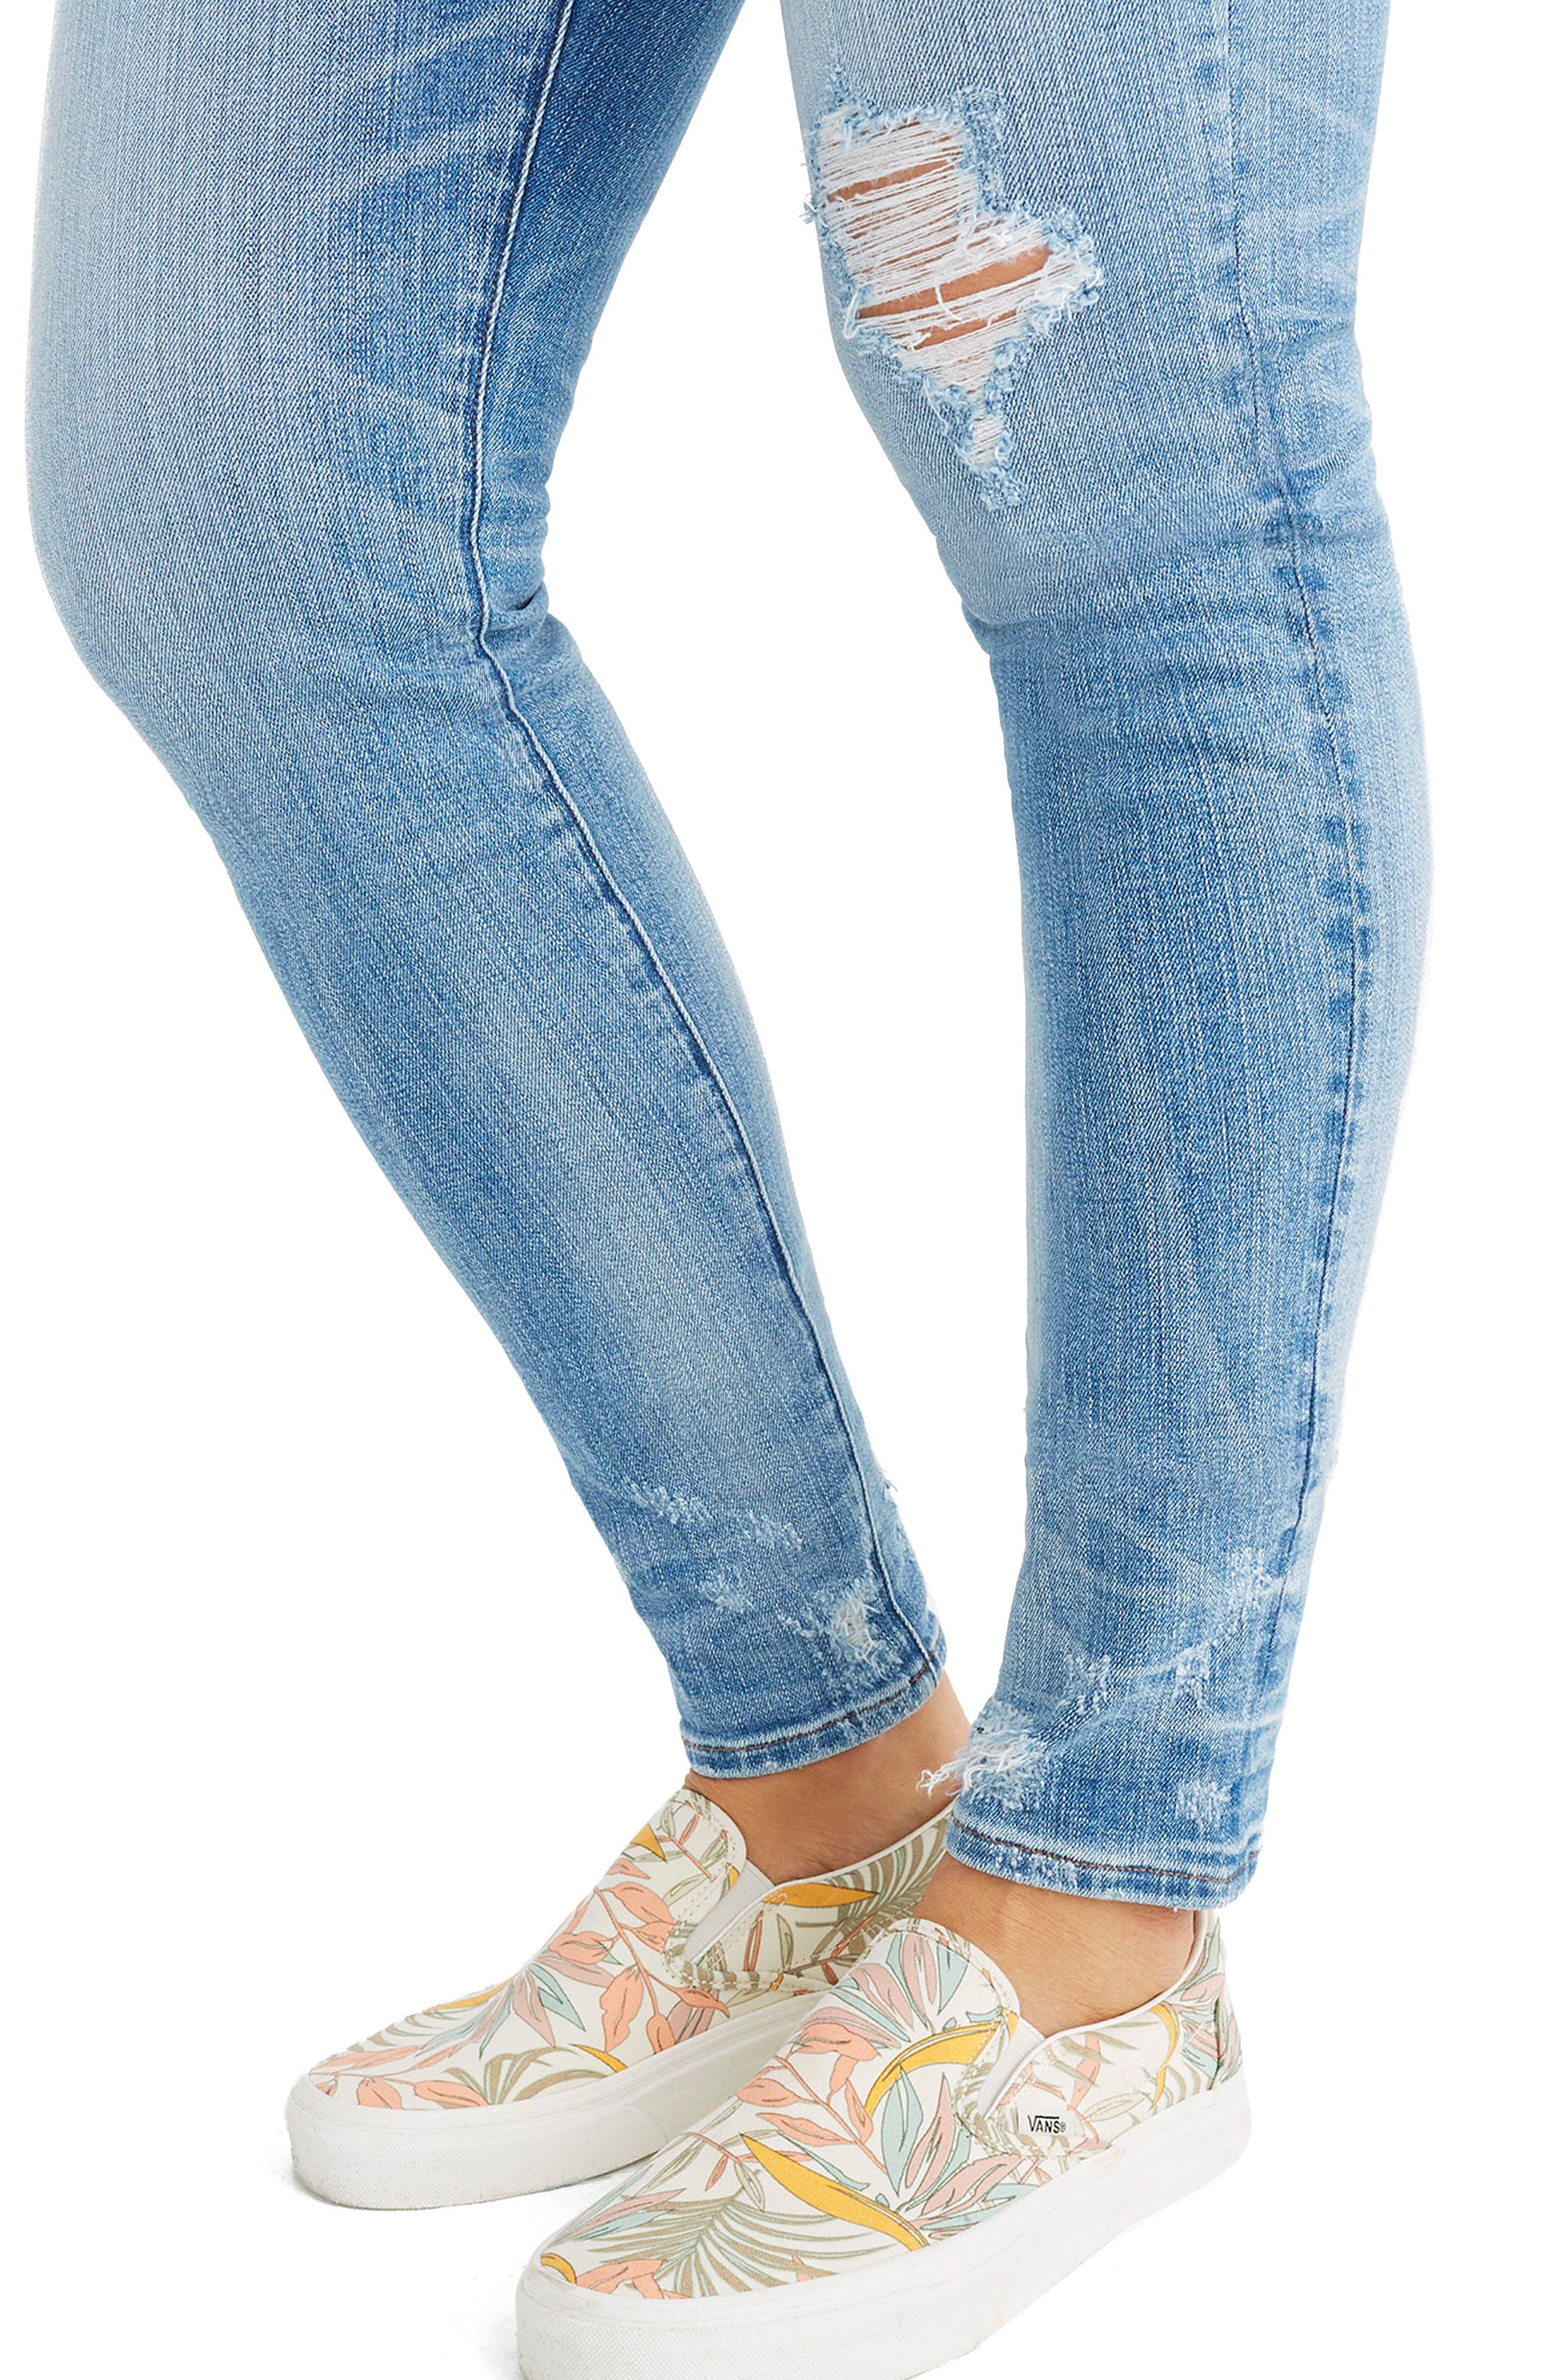 MADEWELL,                             9-Inch Destructed Hem High Waist Skinny Jeans,                             Alternate thumbnail 6, color,                             400